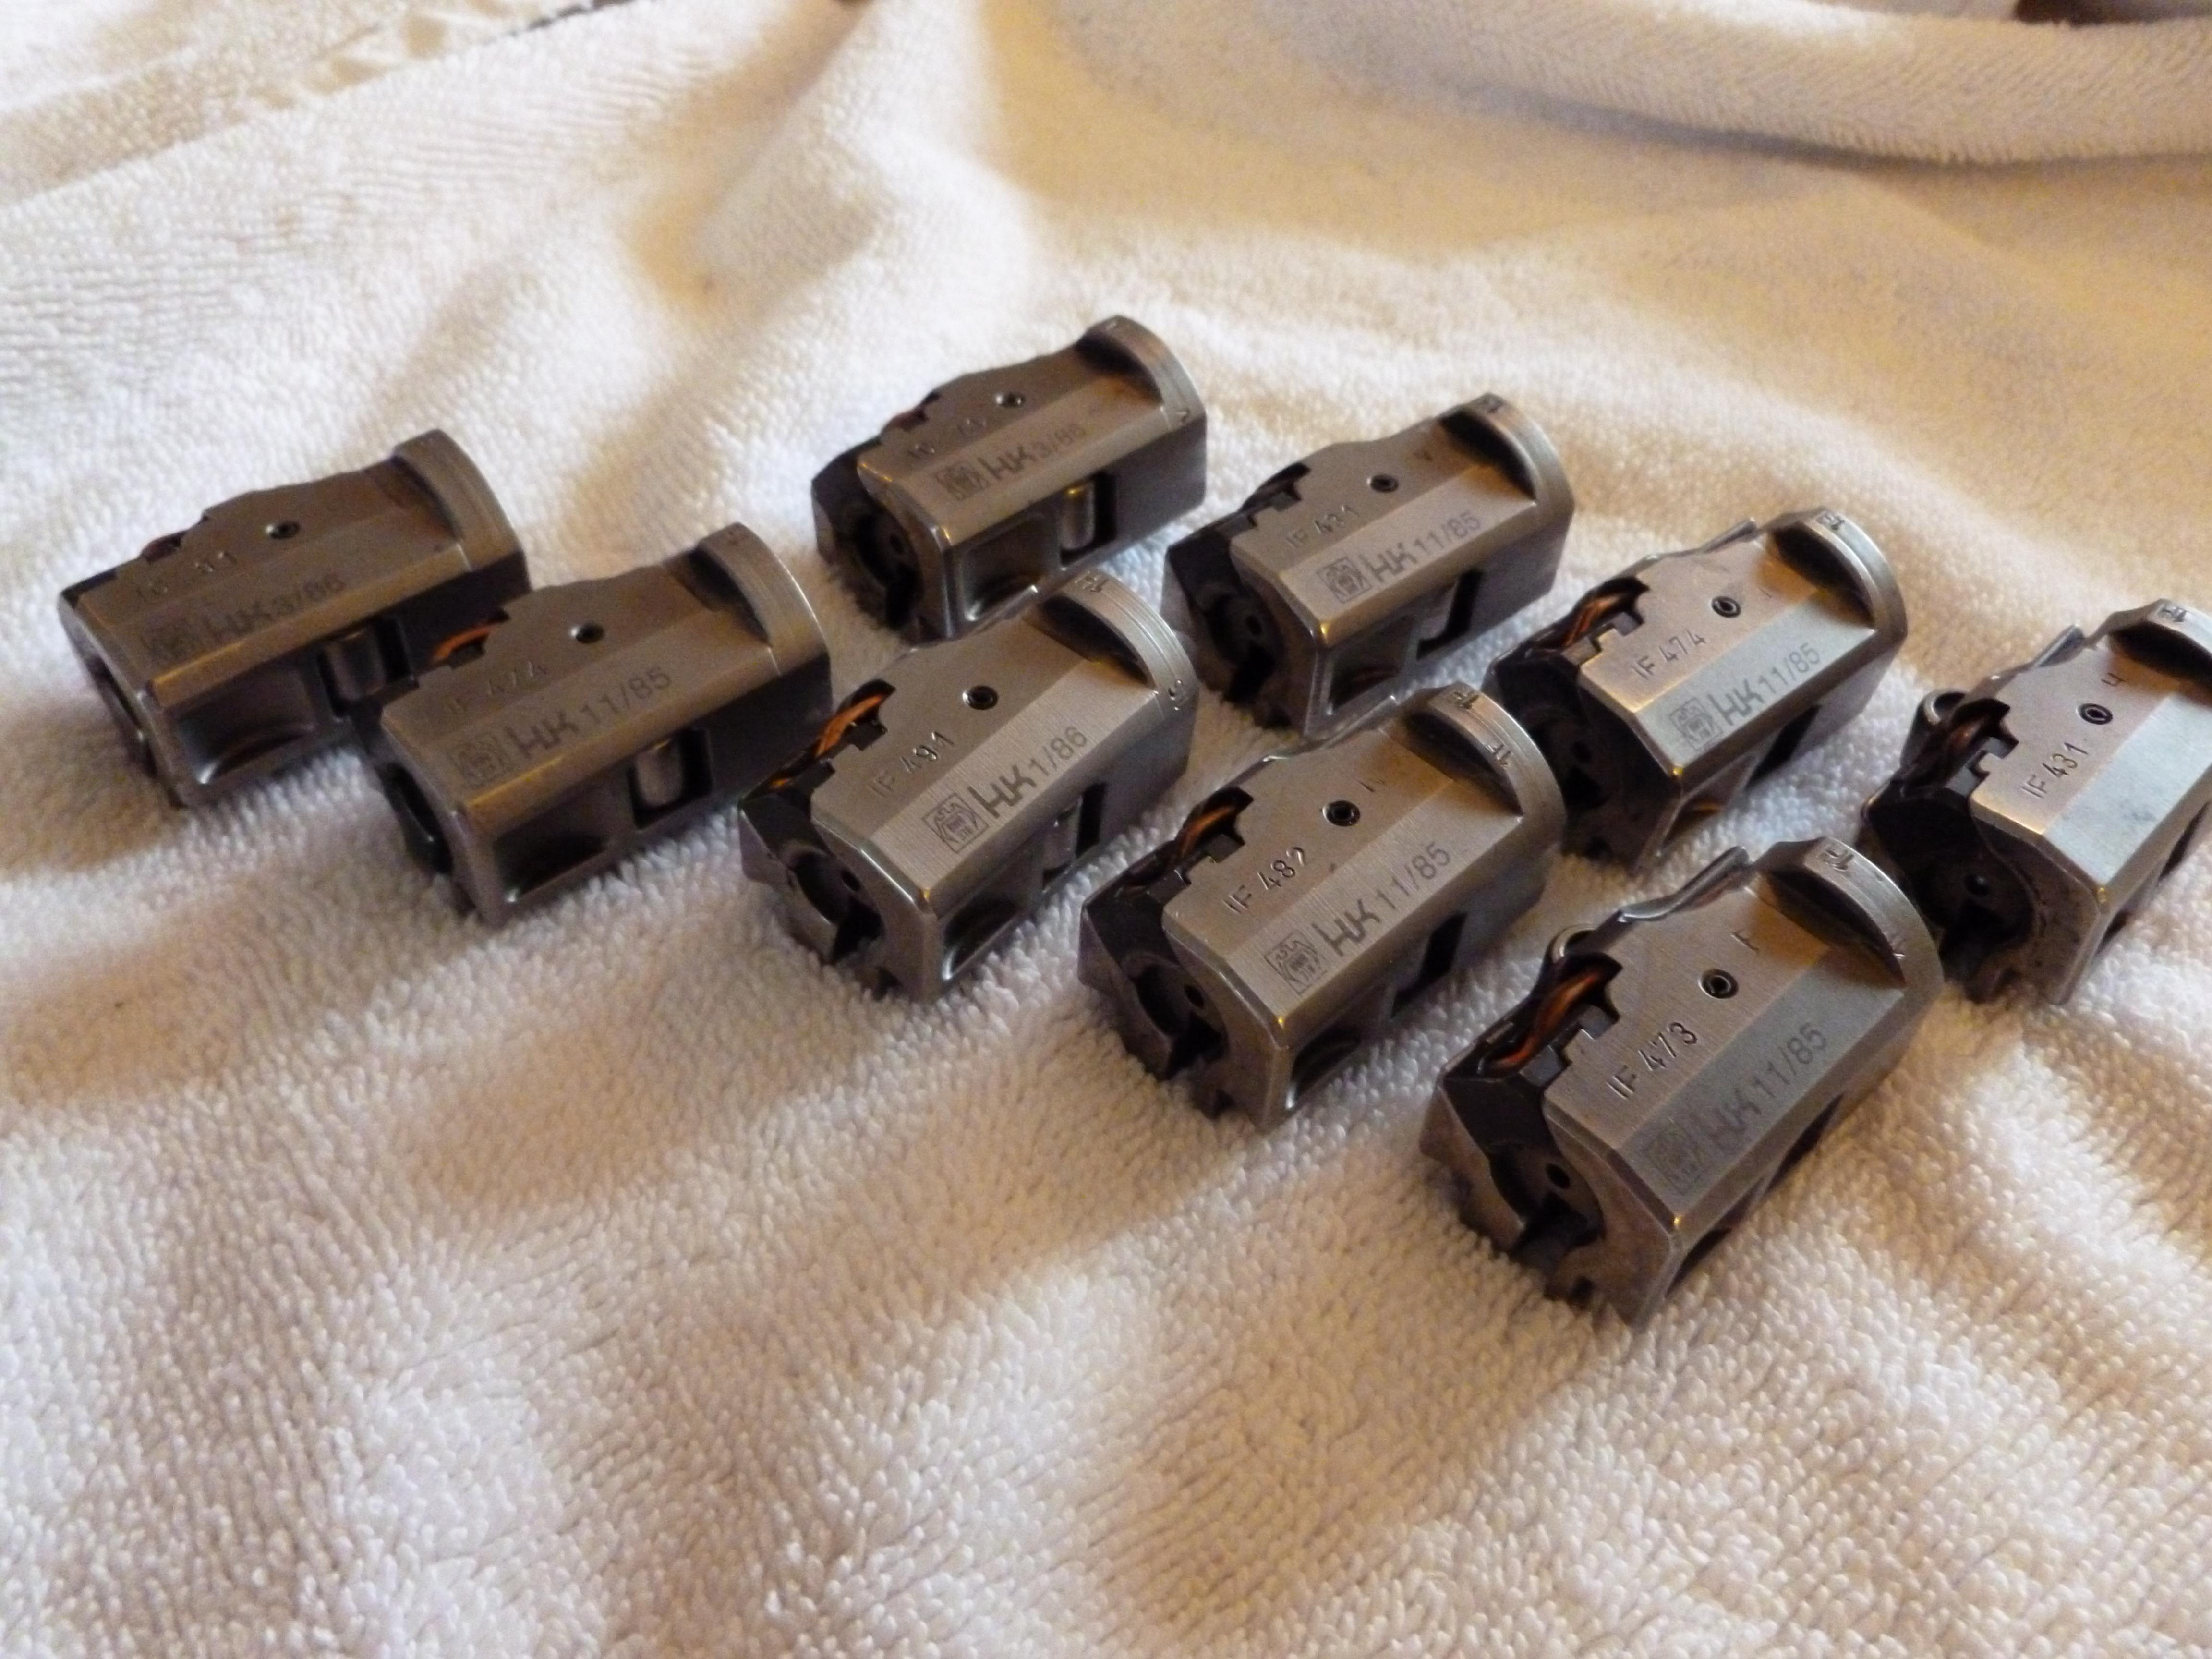 WTS: PRICE REDUCTION - Original HK MP5 9mm Bolt Head Assembles - USED-p1030438.jpg